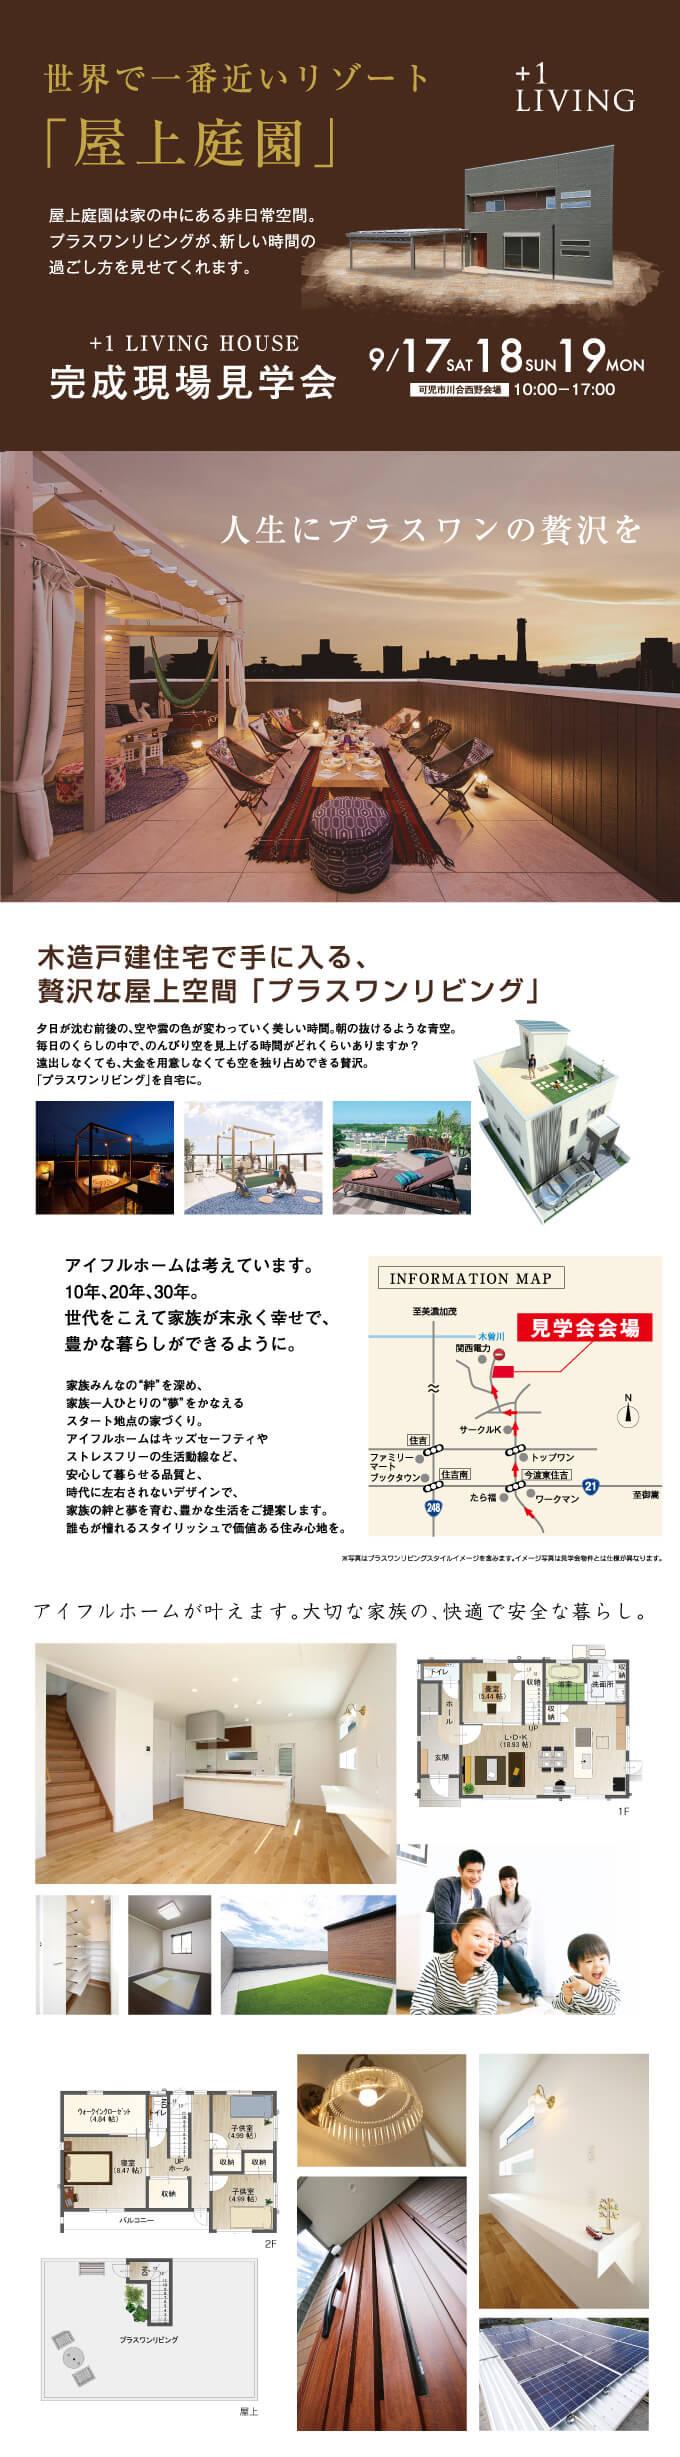 201609_kani-01.jpg